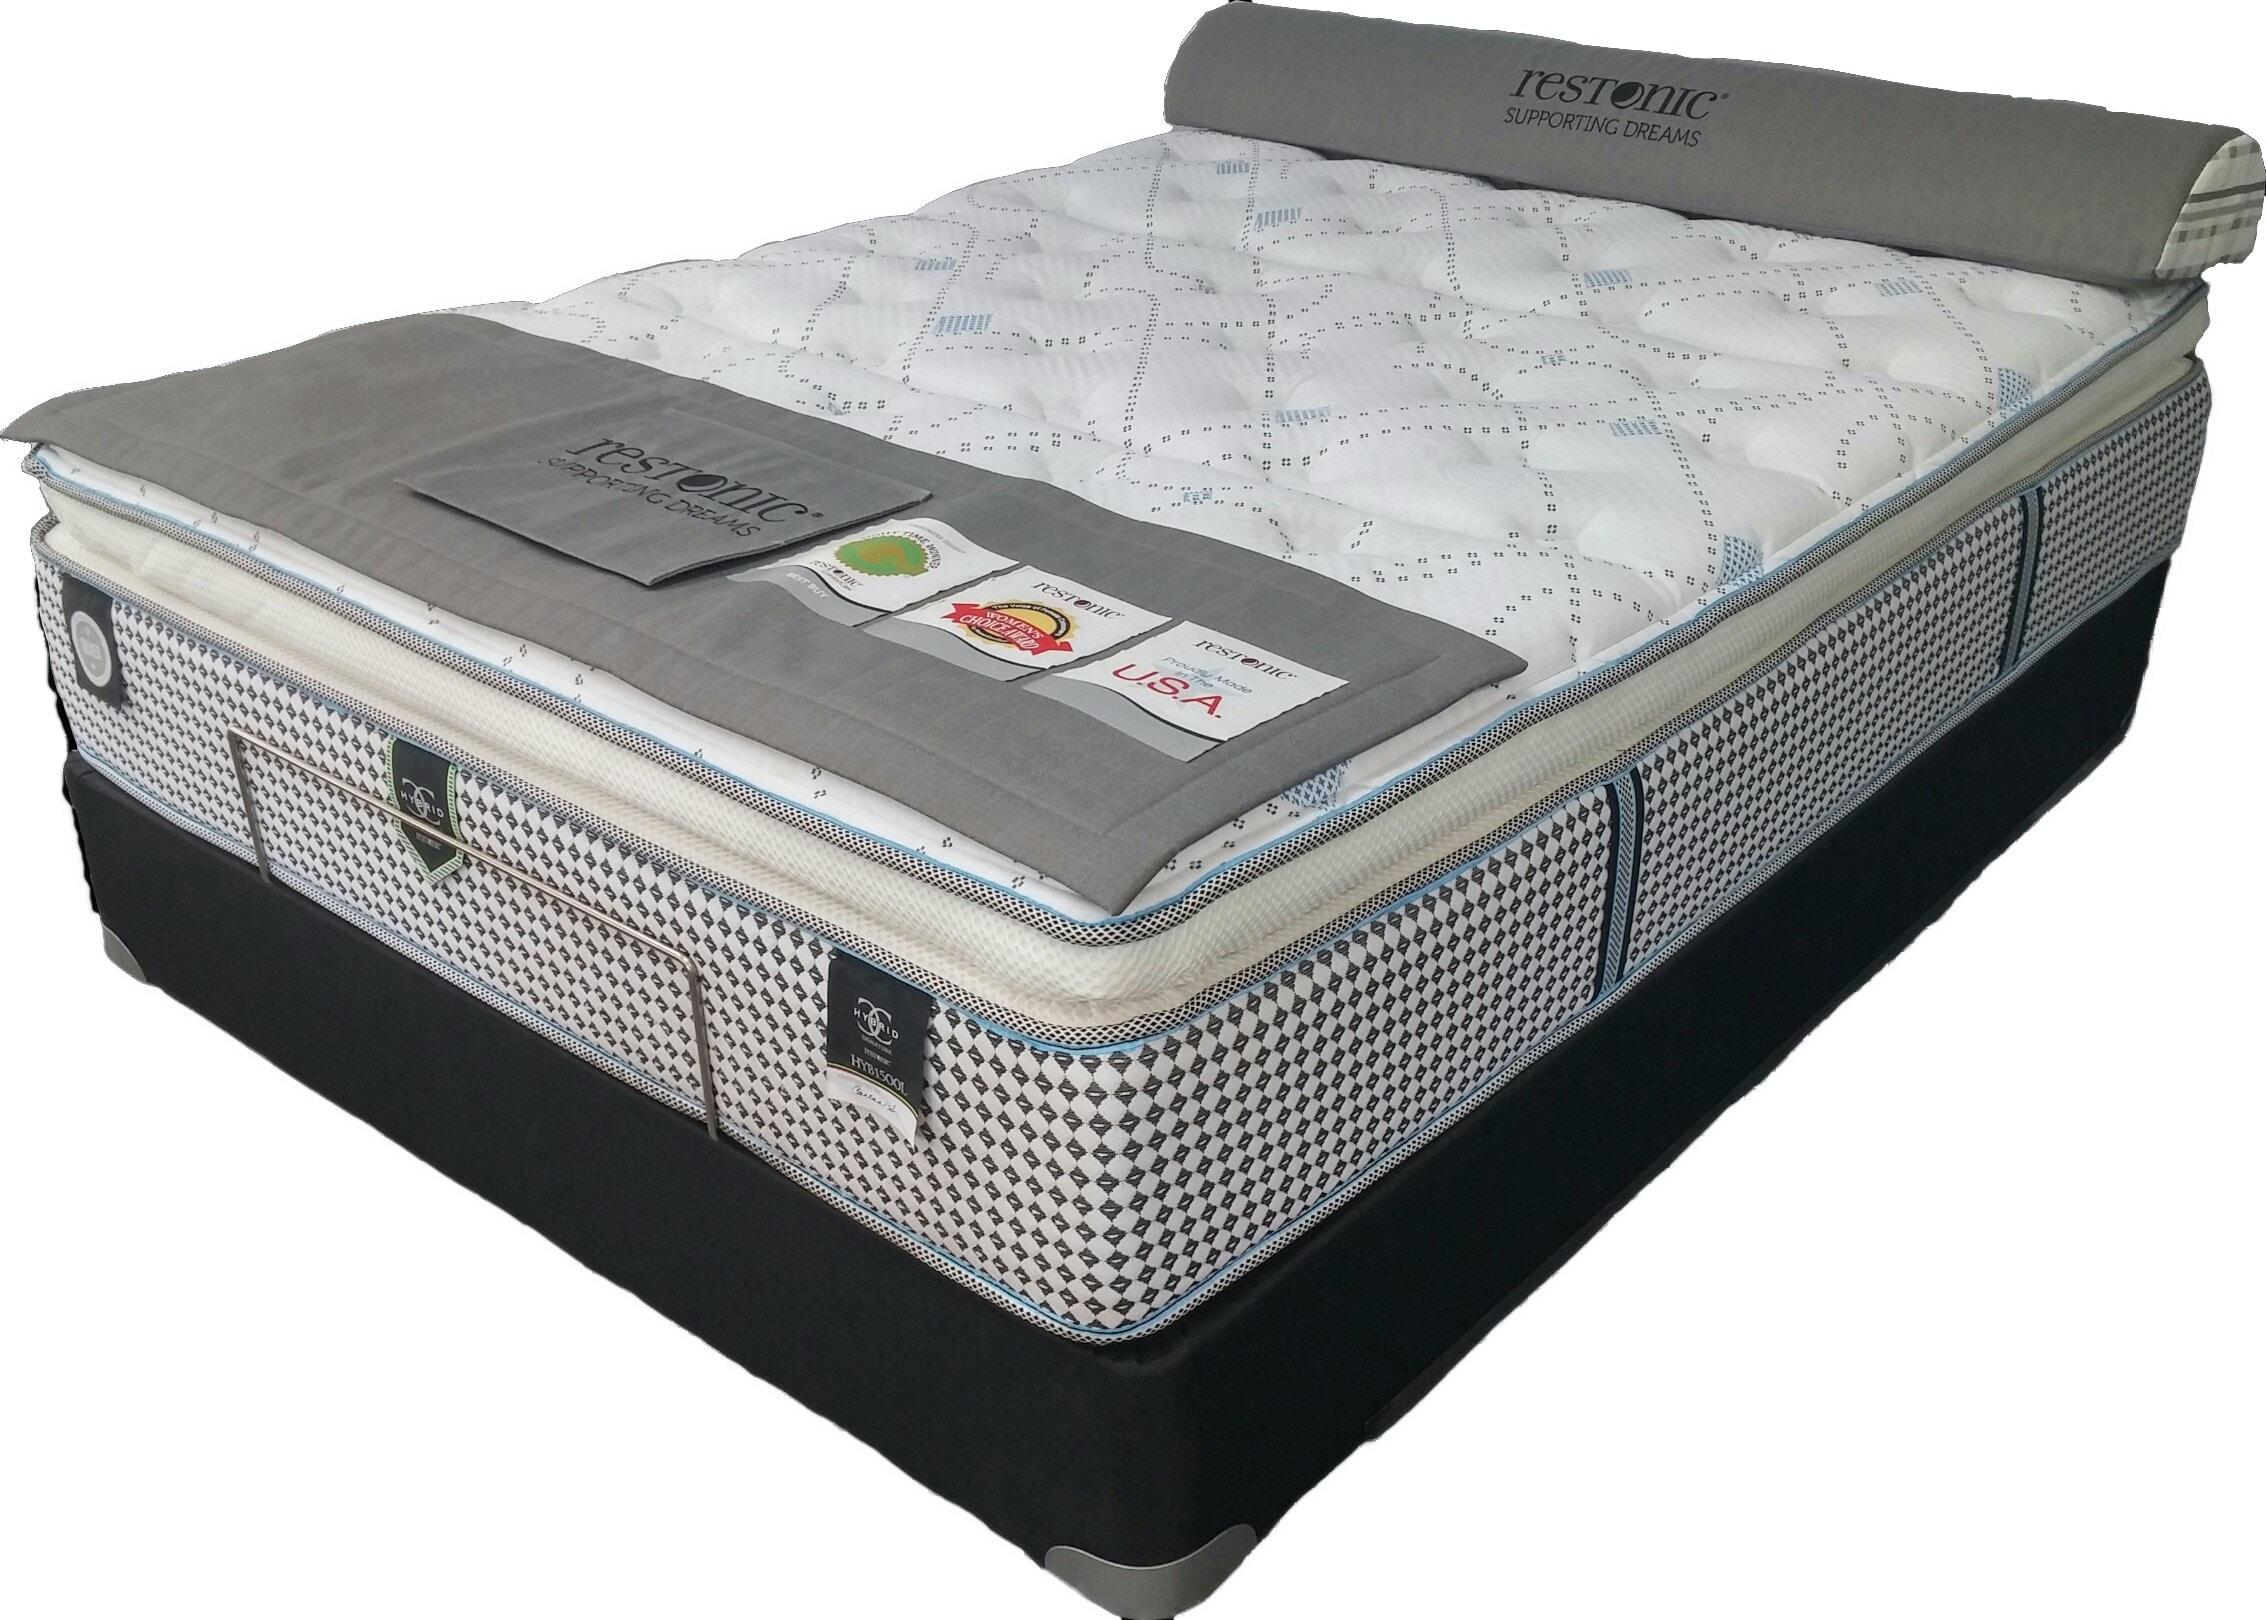 Restonic Mattresses Pillowtop Mattress Set HYB1500L